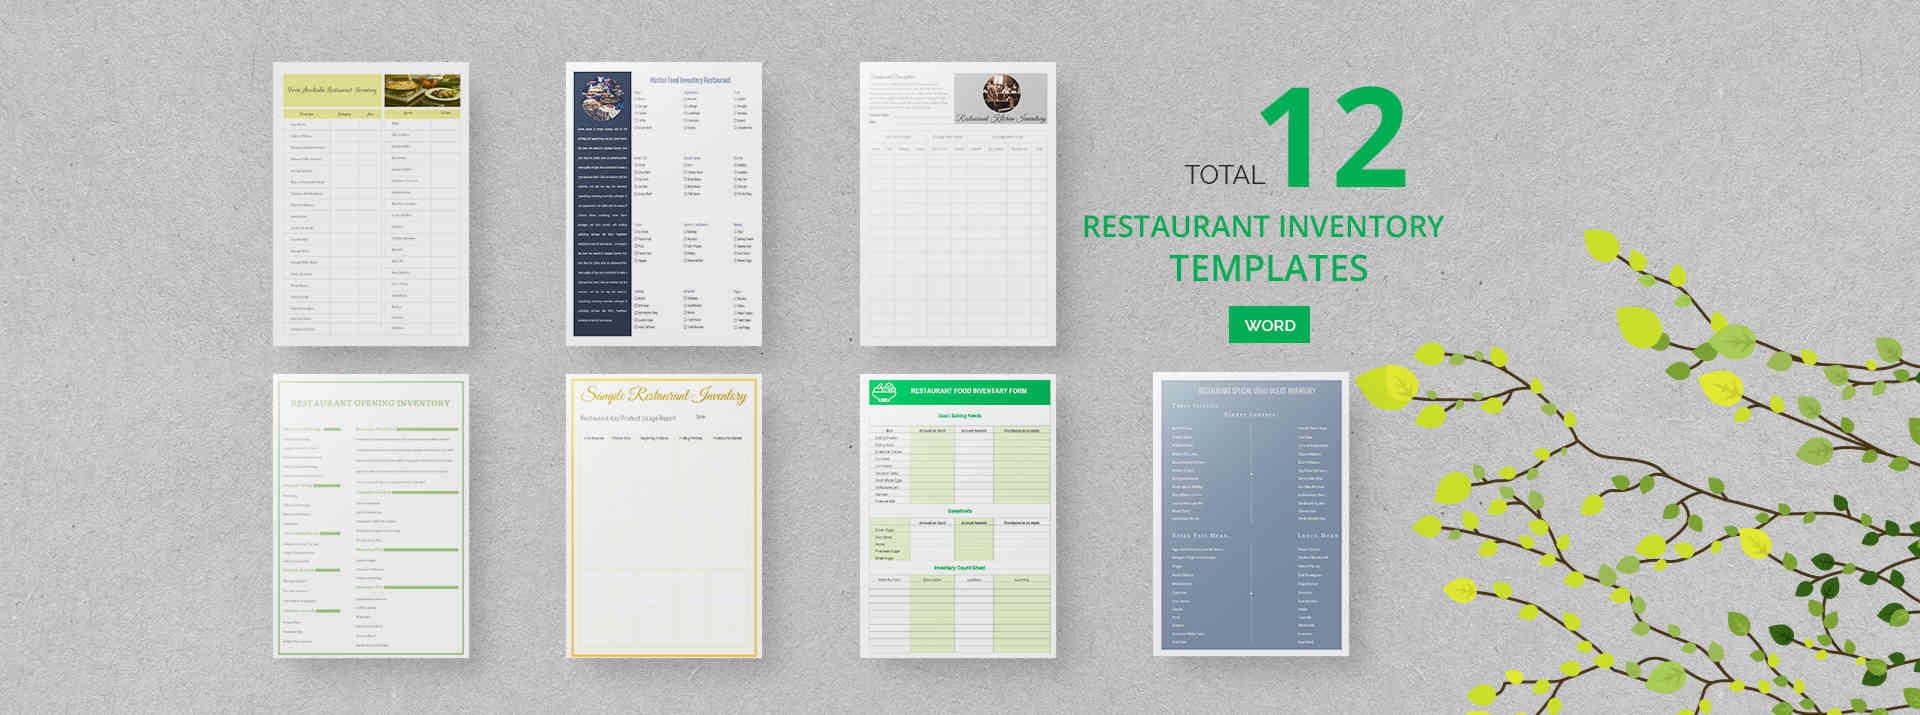 Restaurant Floor Plan Template Free: Restaurant Kitchen Layout Templates Deluxe Home Design